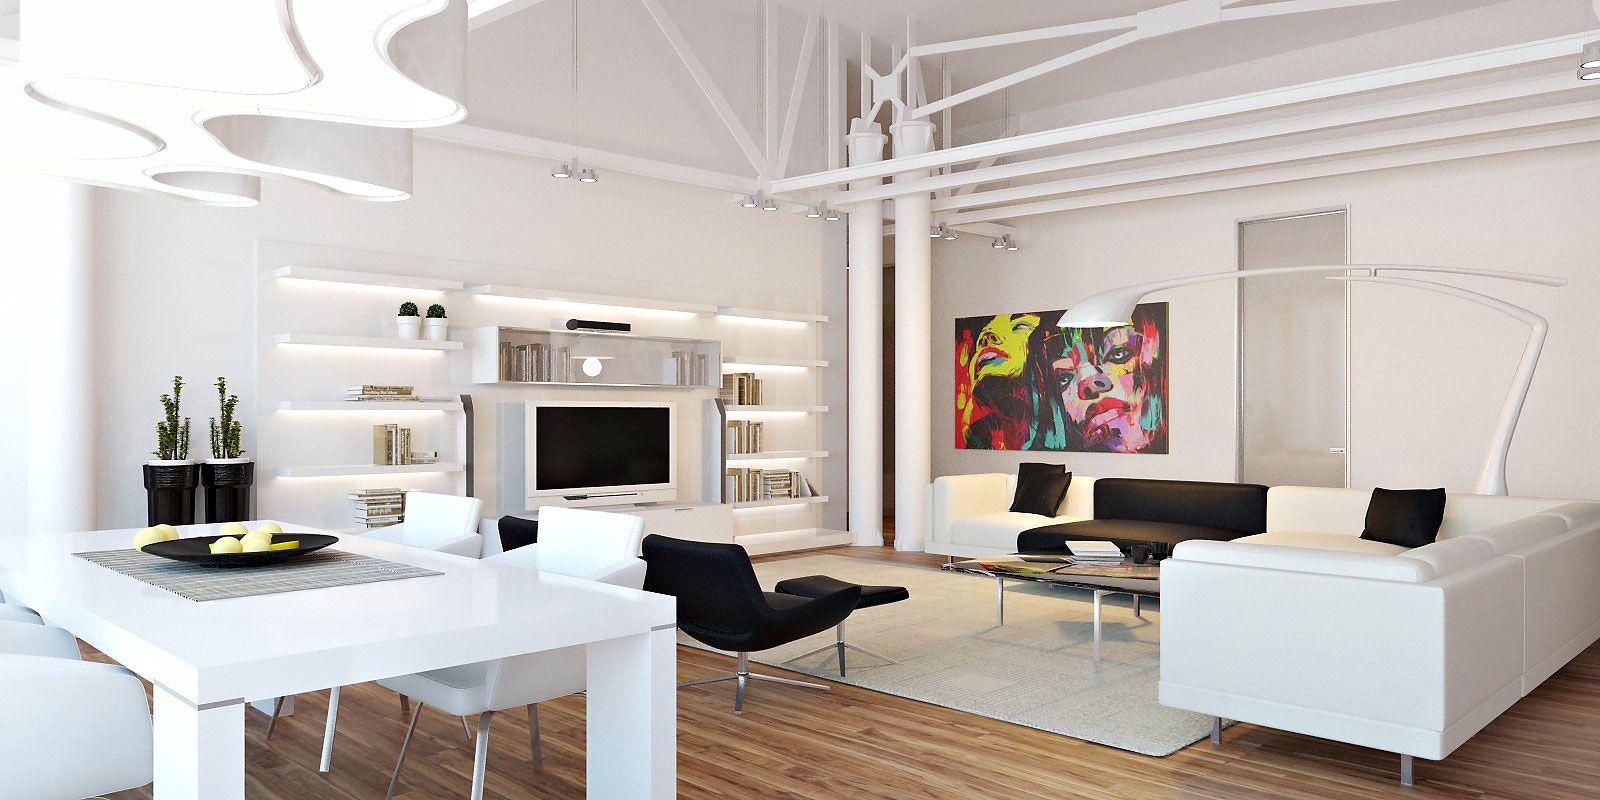 Loft Apartment In Chisinau By Grosu Art Studio CAANdesign Architecture An